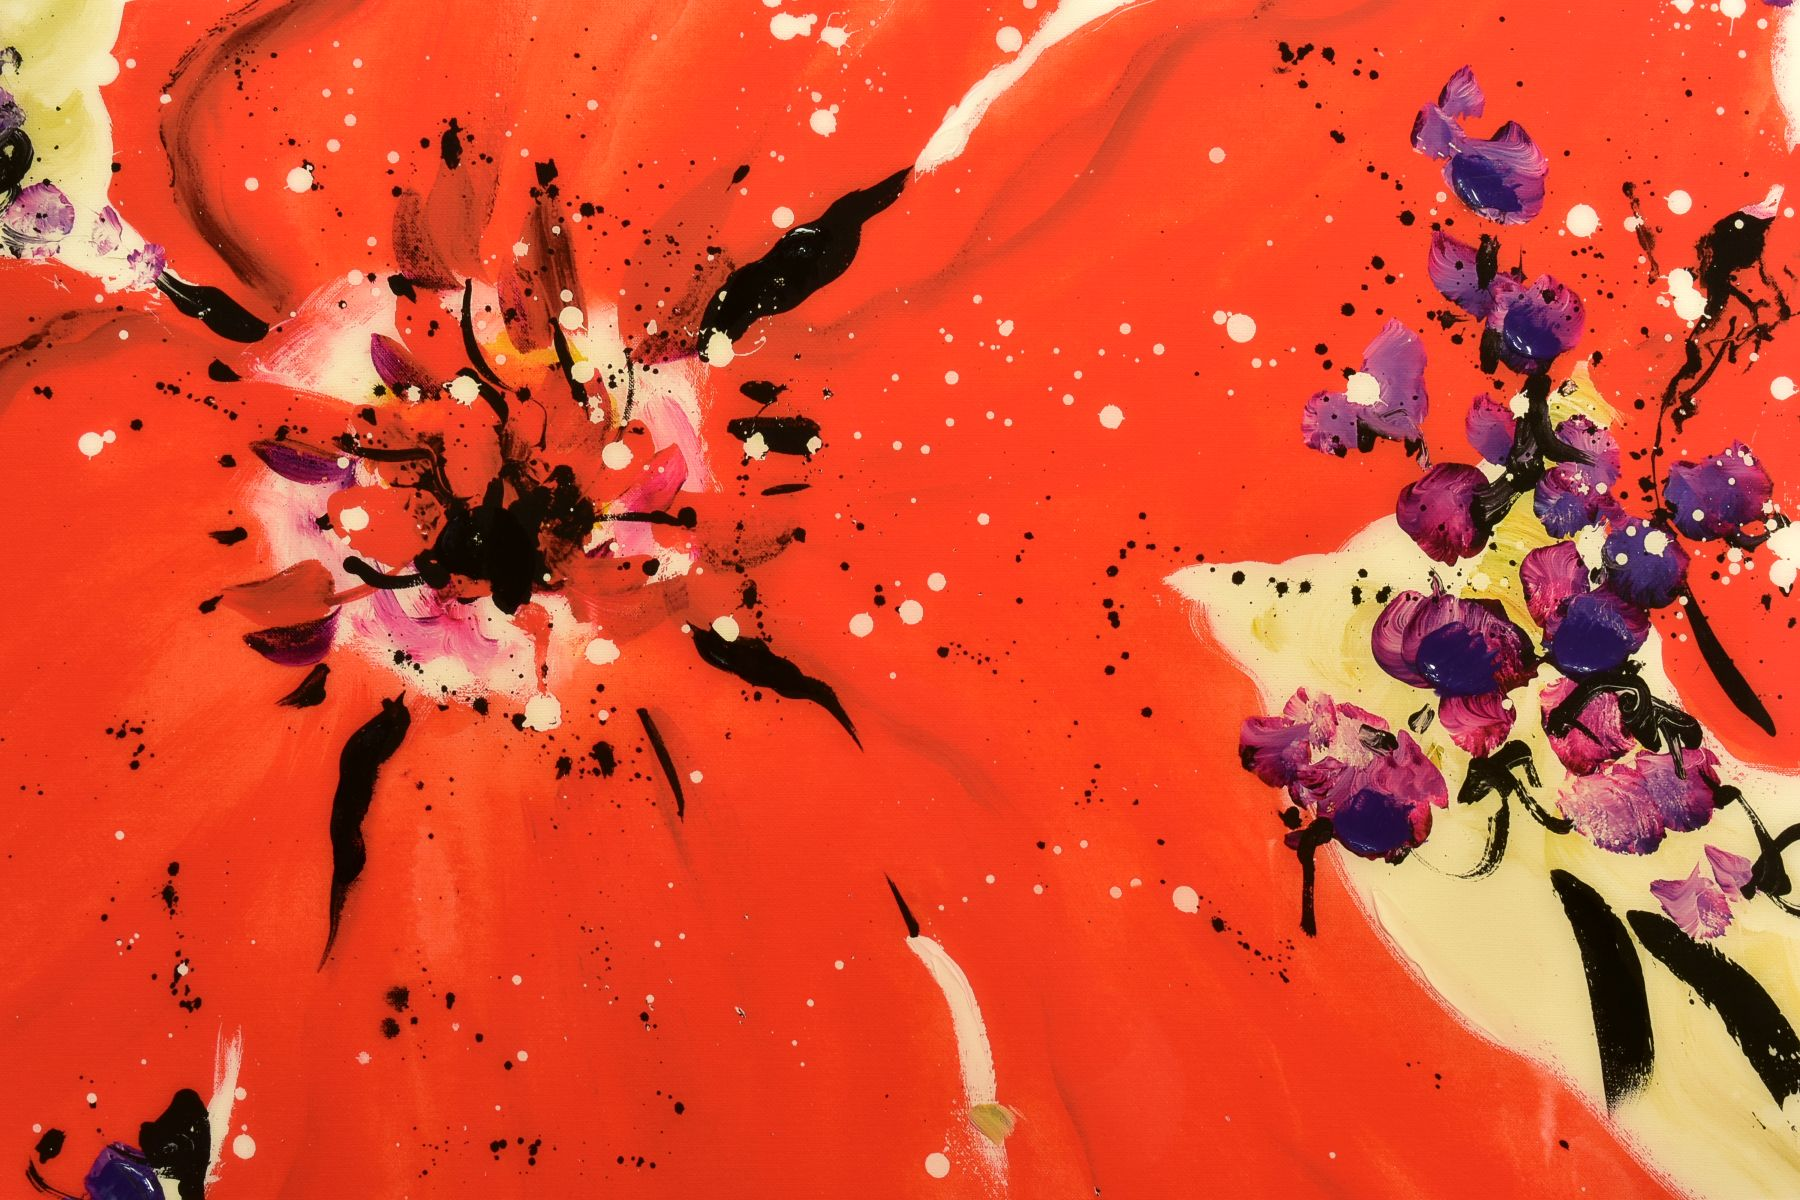 DANIELLE O'CONNOR AKIYAMA (CANADA 1957), 'Journey I', a Limited Edition print of blossom, 36/195, - Image 2 of 5